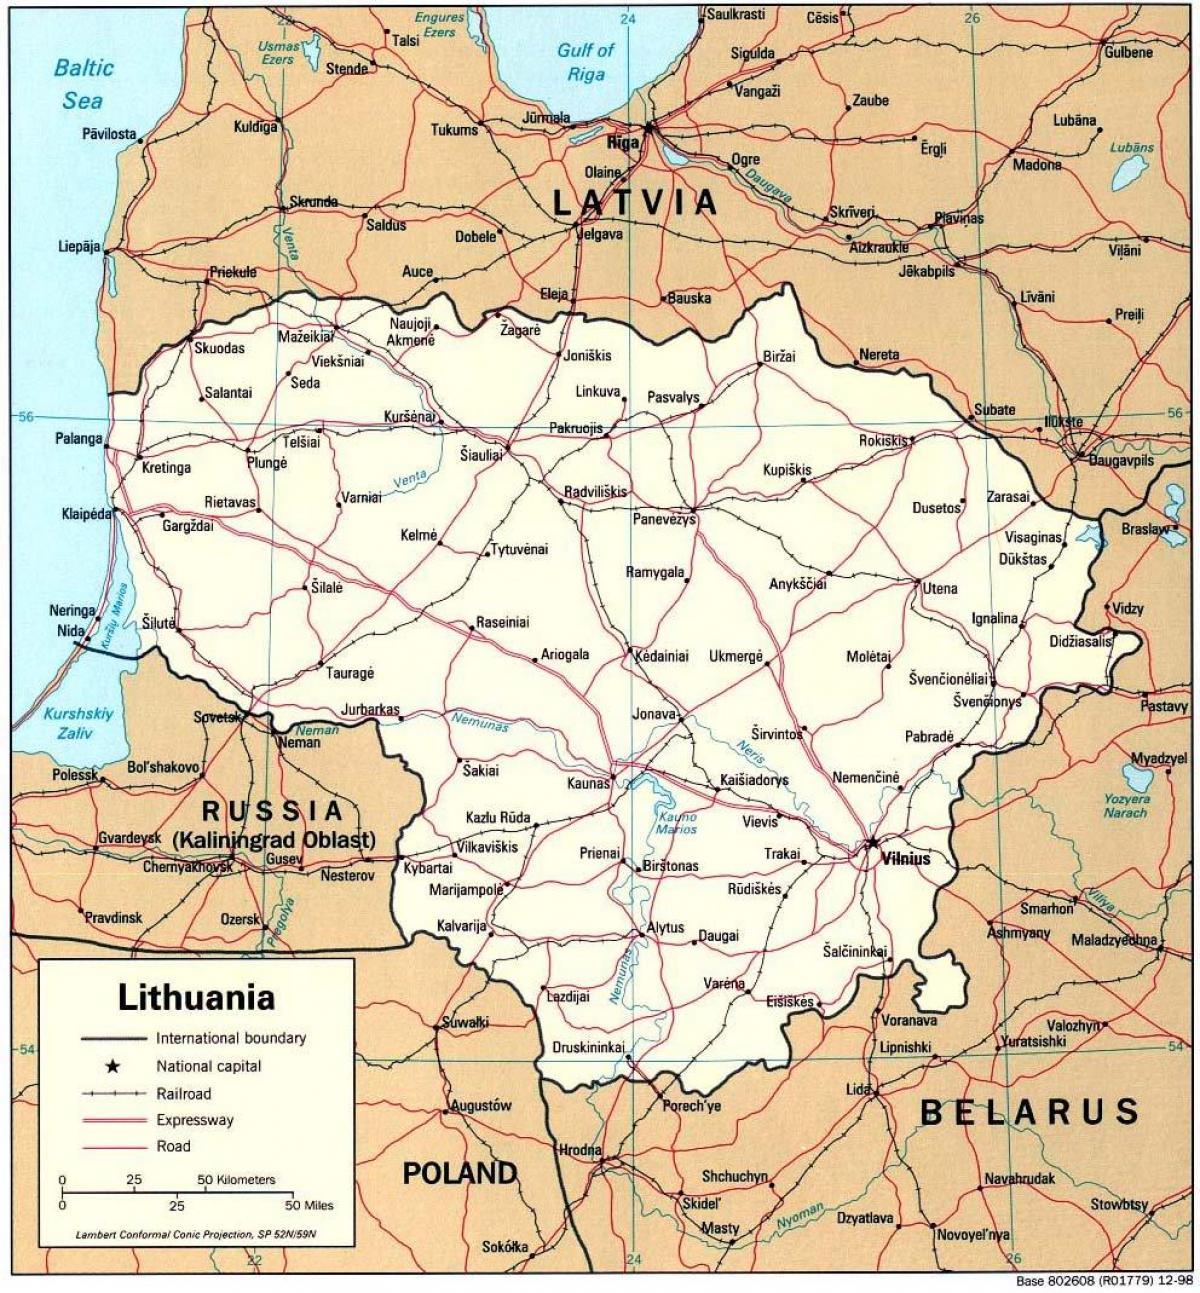 Liettua Kartta Kartan Liettua Pohjois Eurooppa Eurooppa